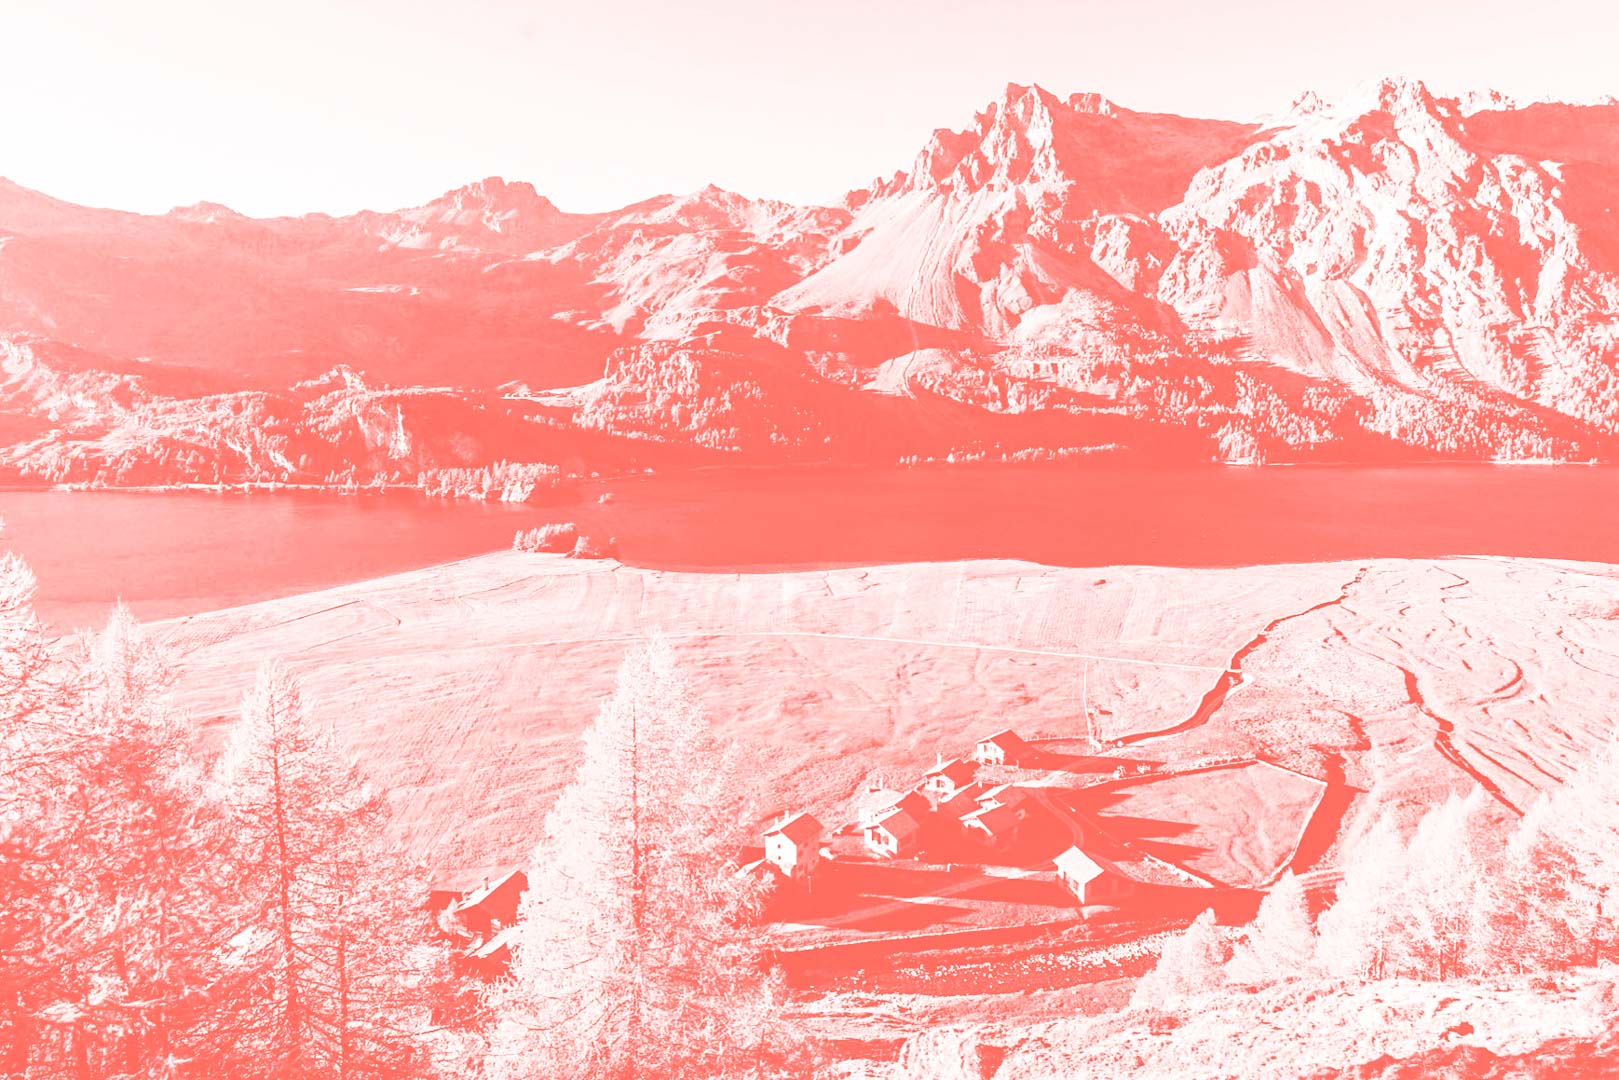 17122018-4Pantone16-1546-Isola.jpg